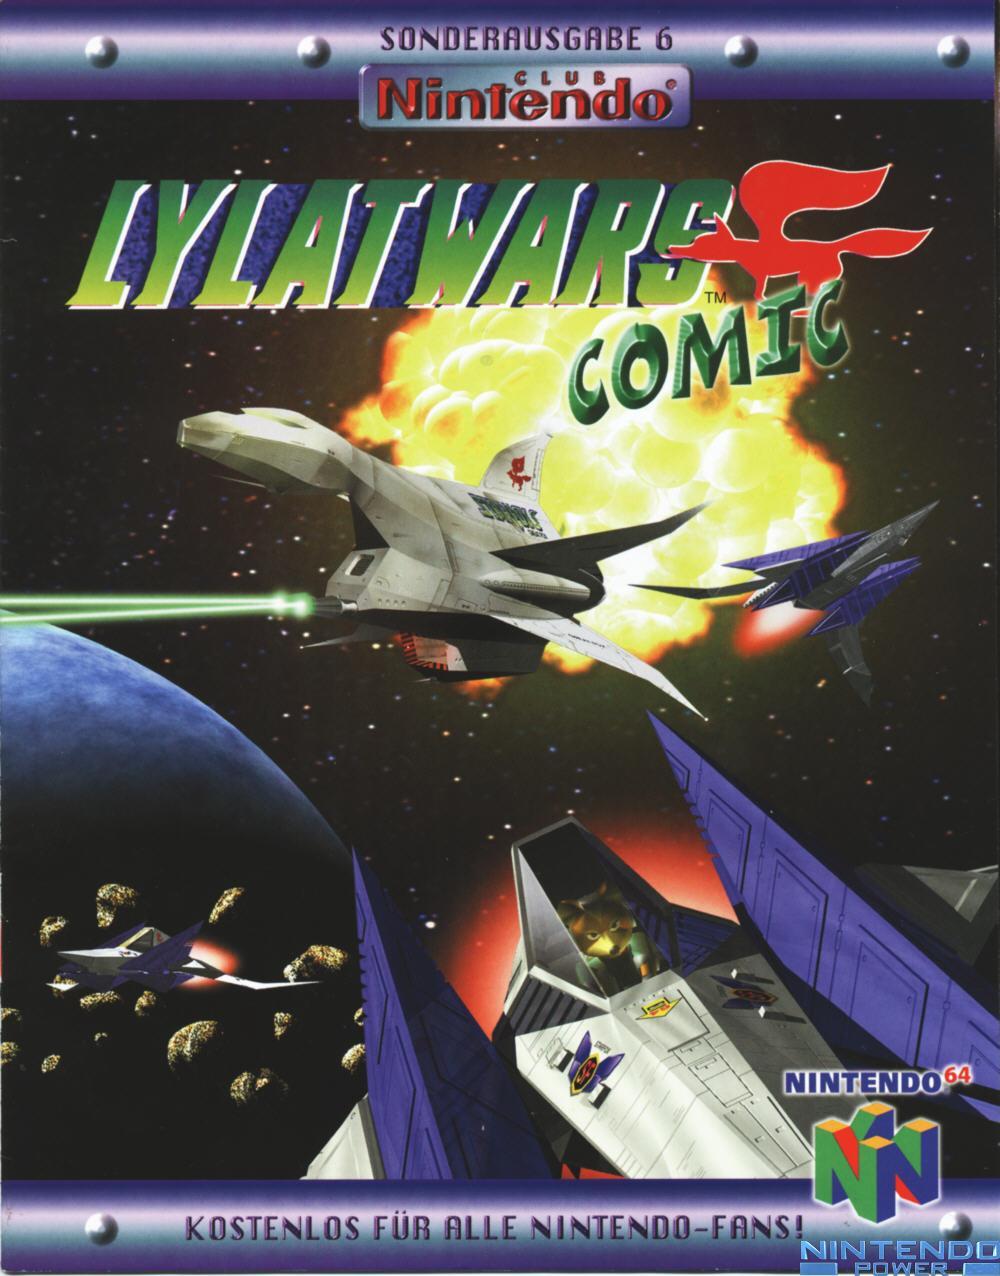 Lylat Wars Comic